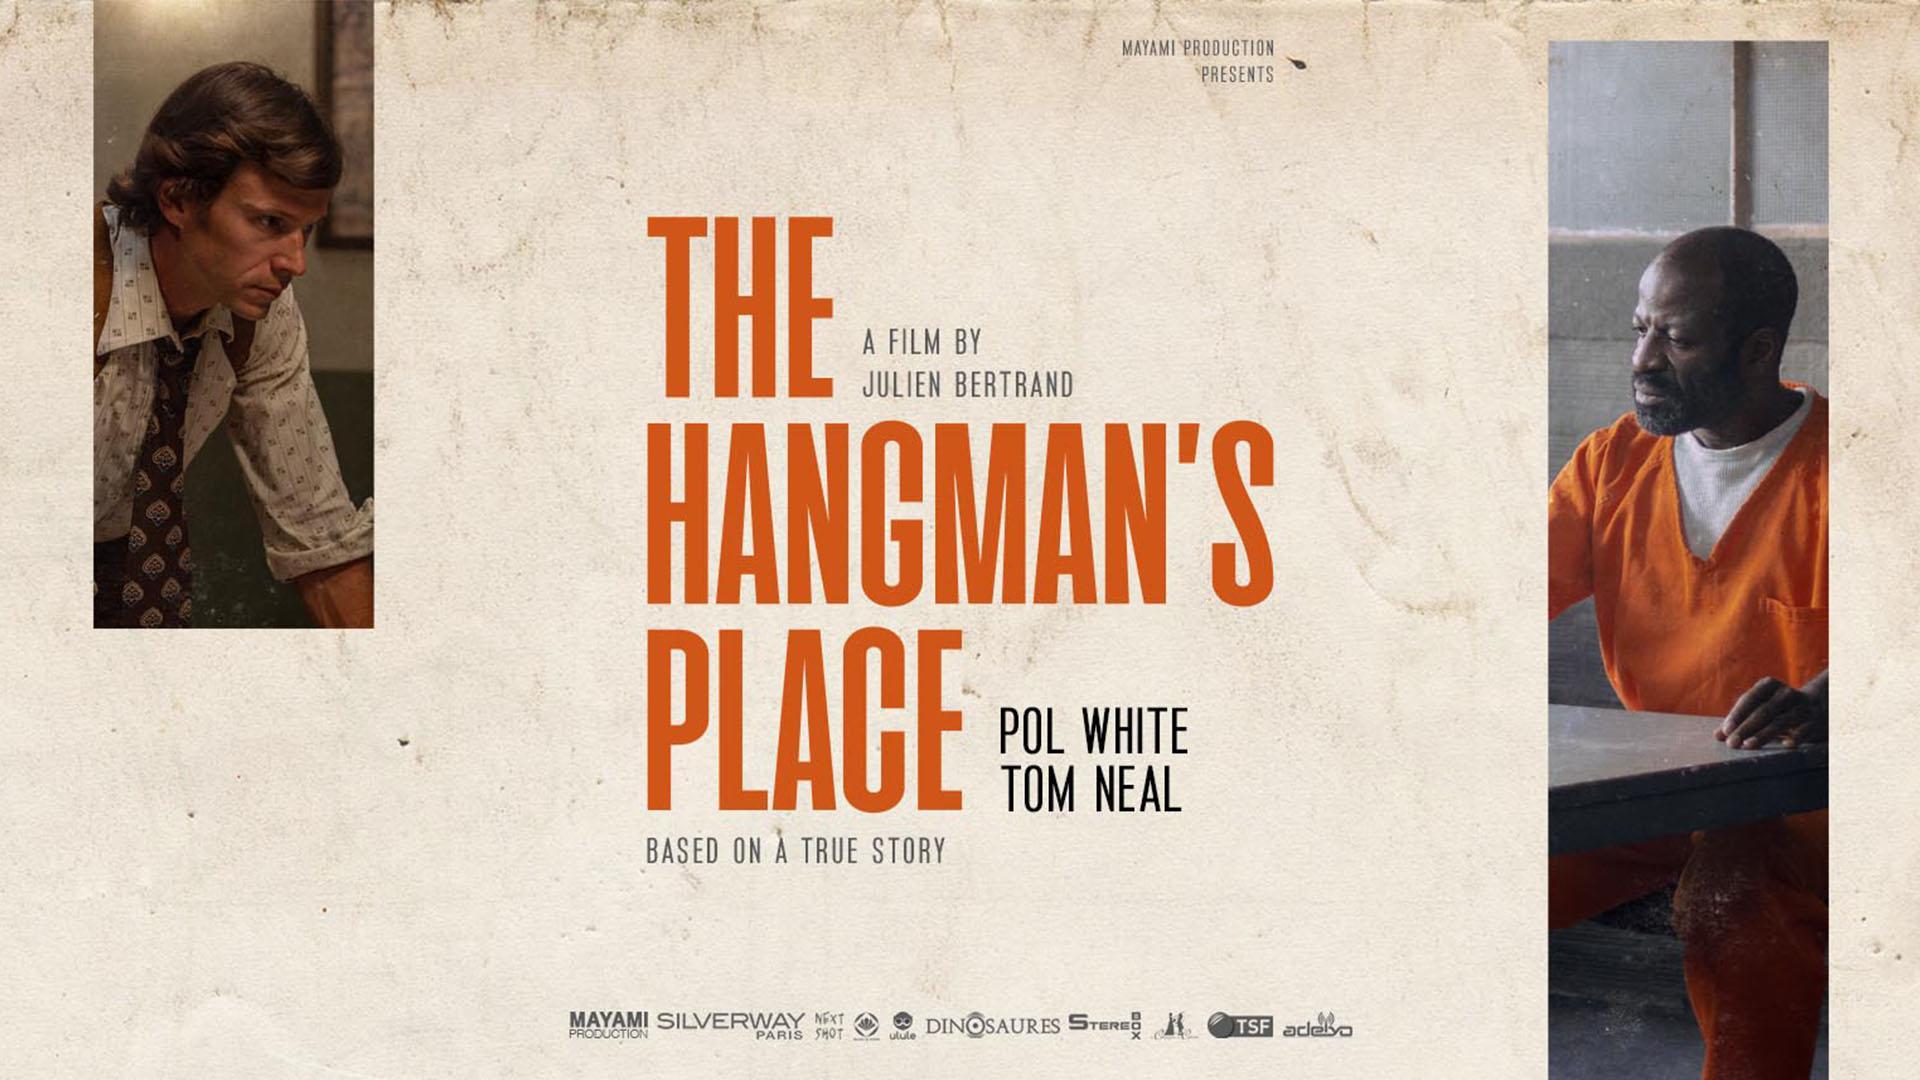 The Hangman's Place